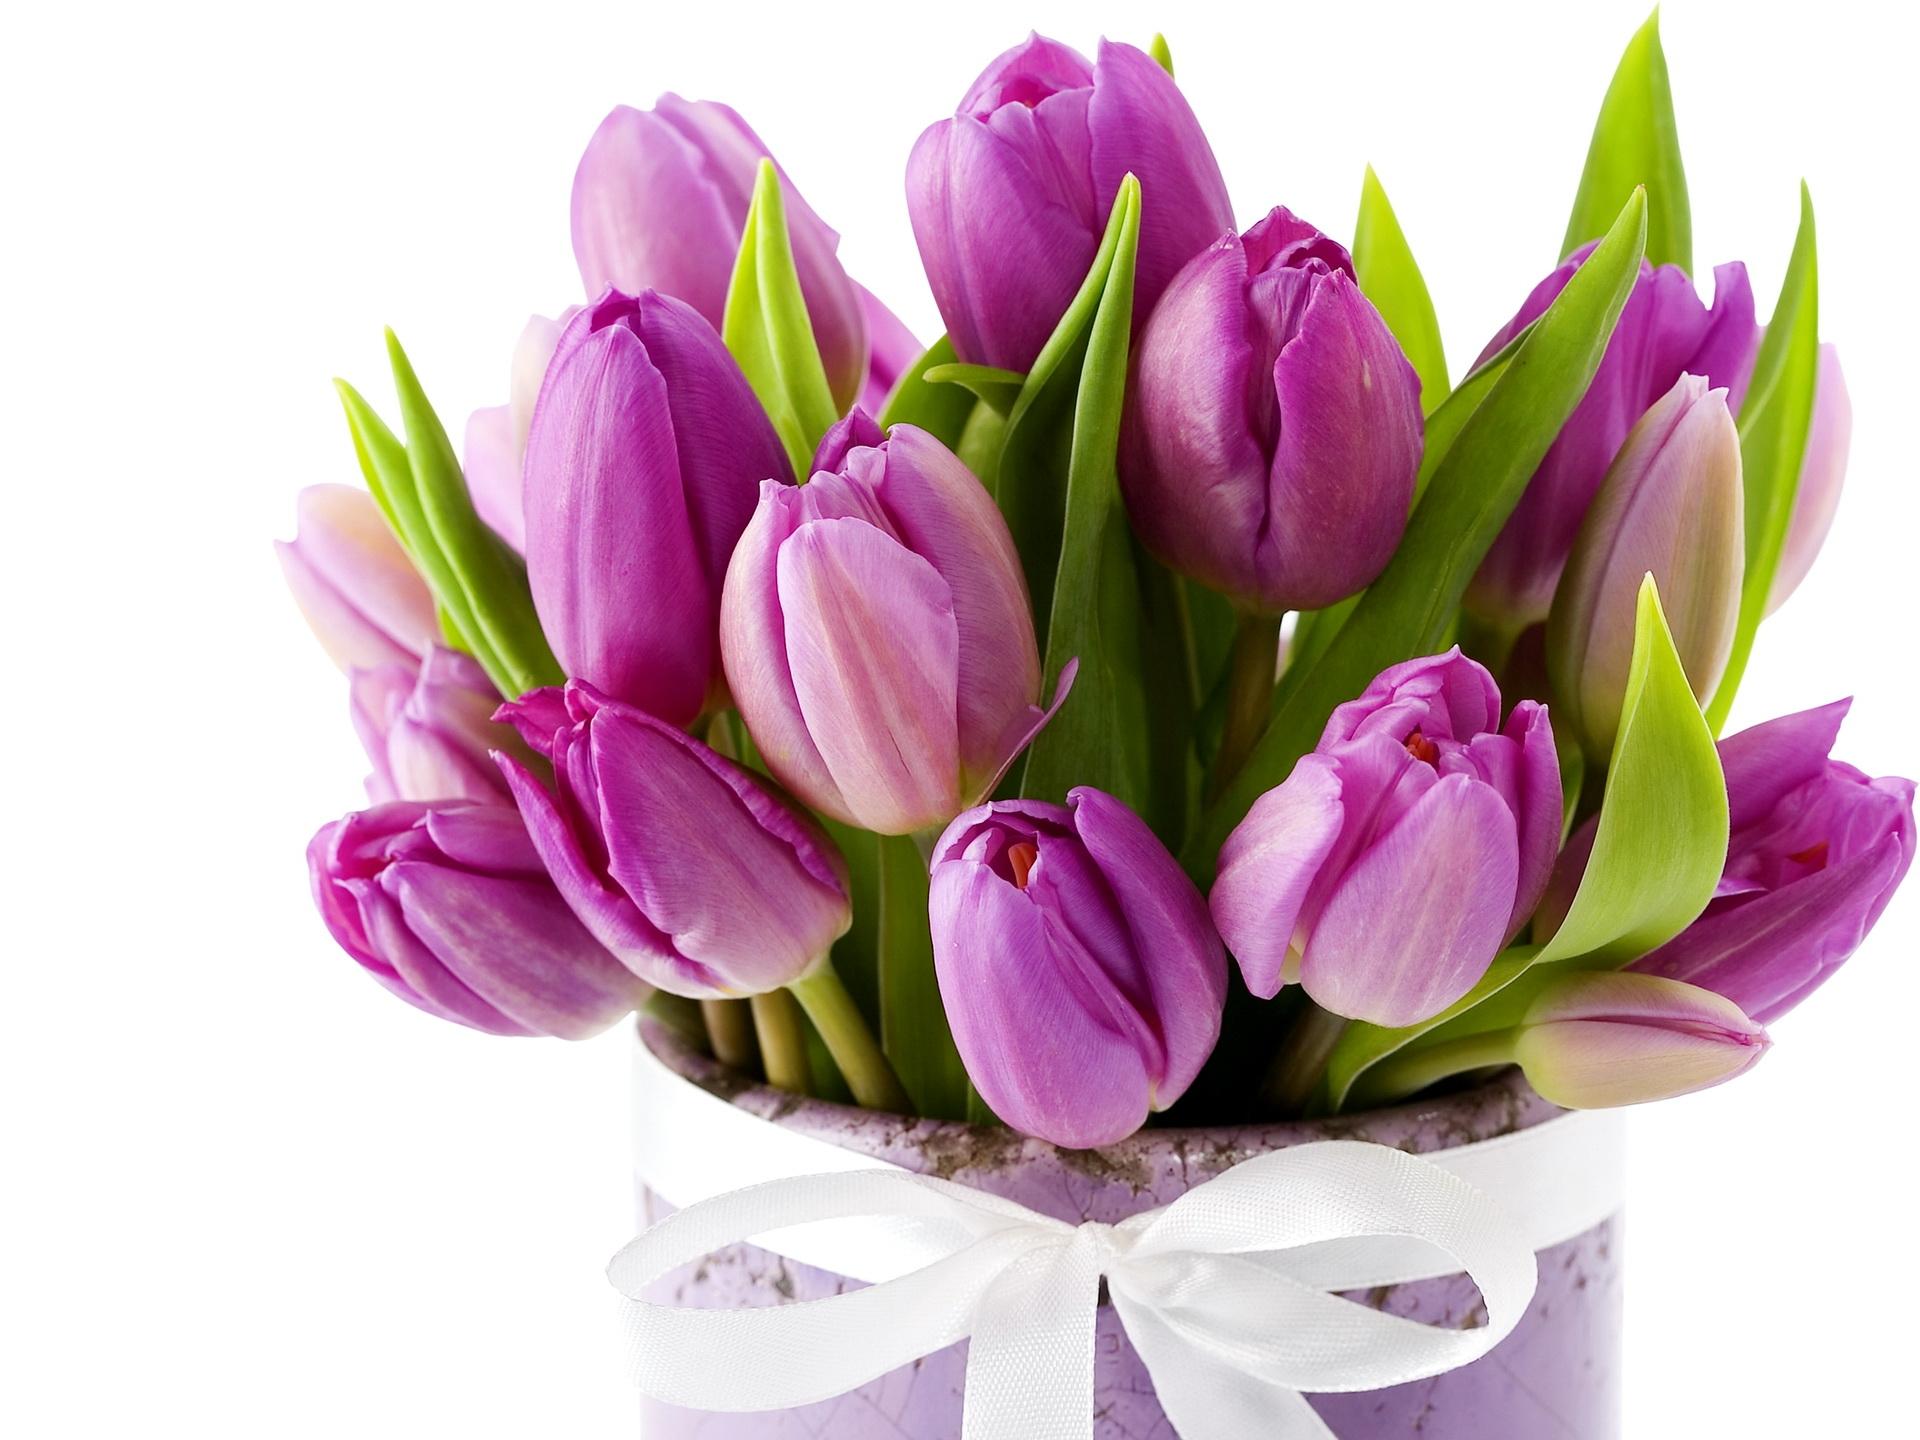 Wallpaper Tulips Flowers Bouquet Vase Ribbon 1920x1440